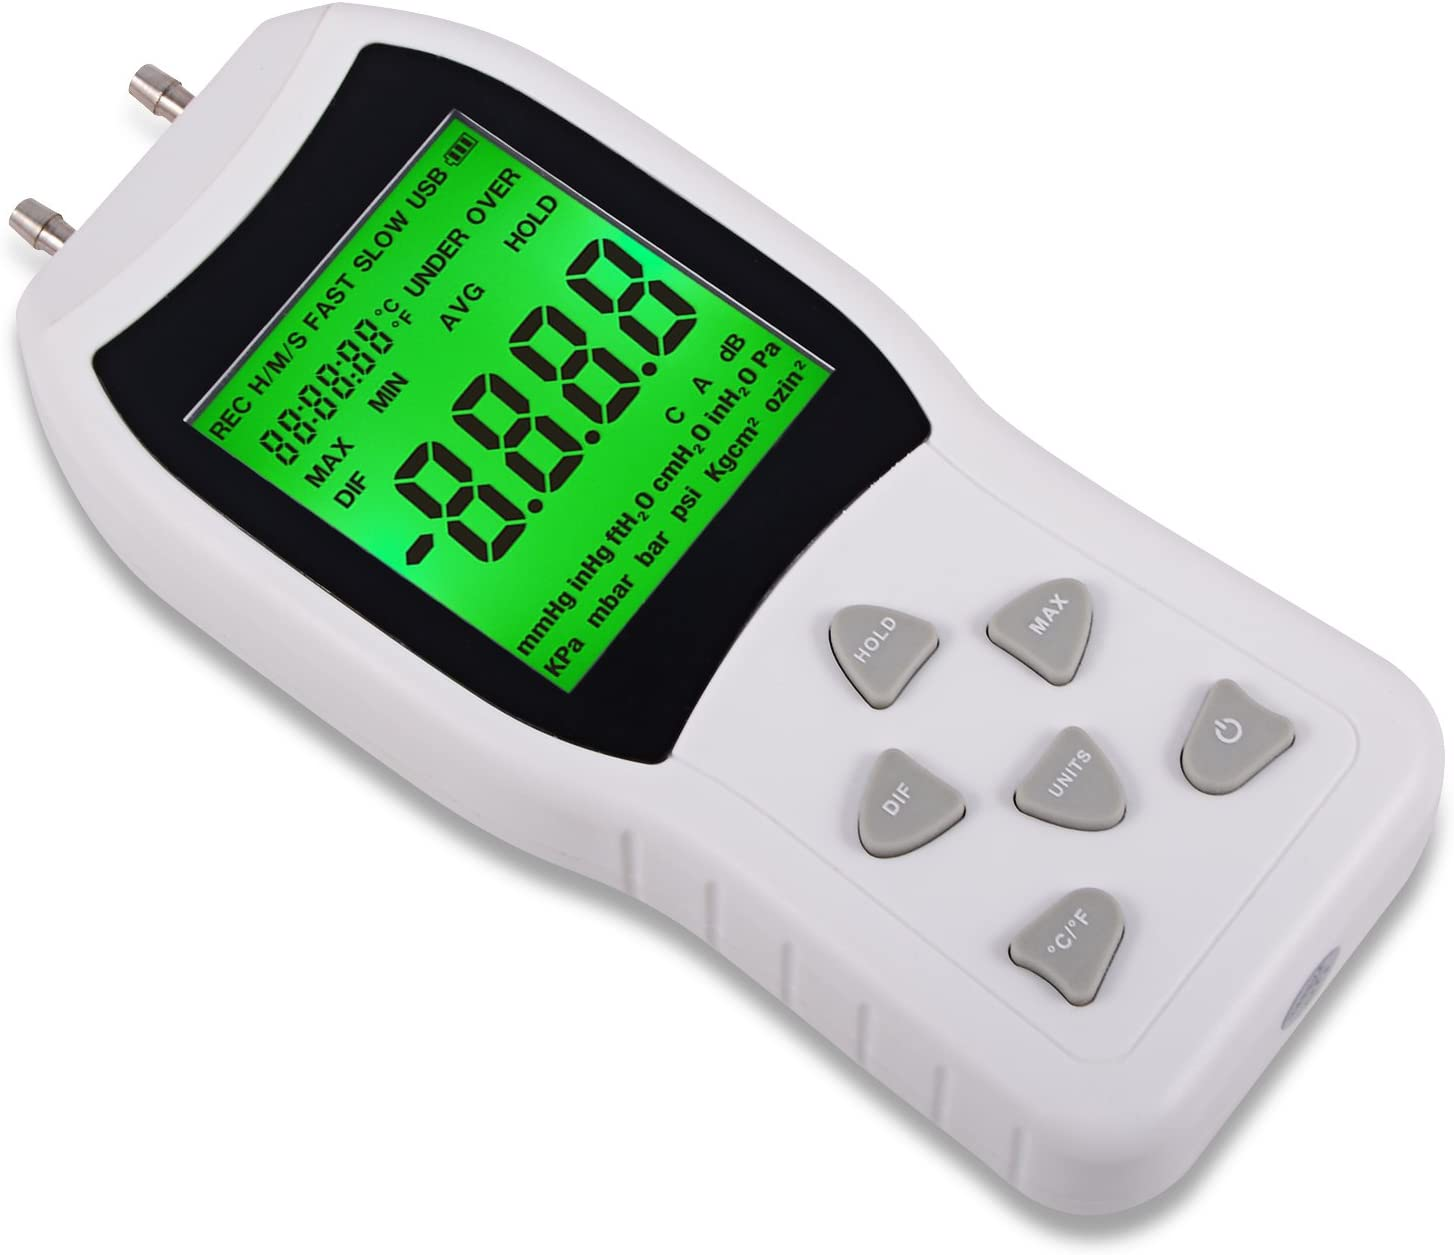 Ehdis Manómetro de portátil Digital Profesional de Doble Puerto presión 11 Unidades de Medida +/- 13.78kPa +/- 2 PSI, para Aspiradora De Aire/Gas, Medidor De Presión